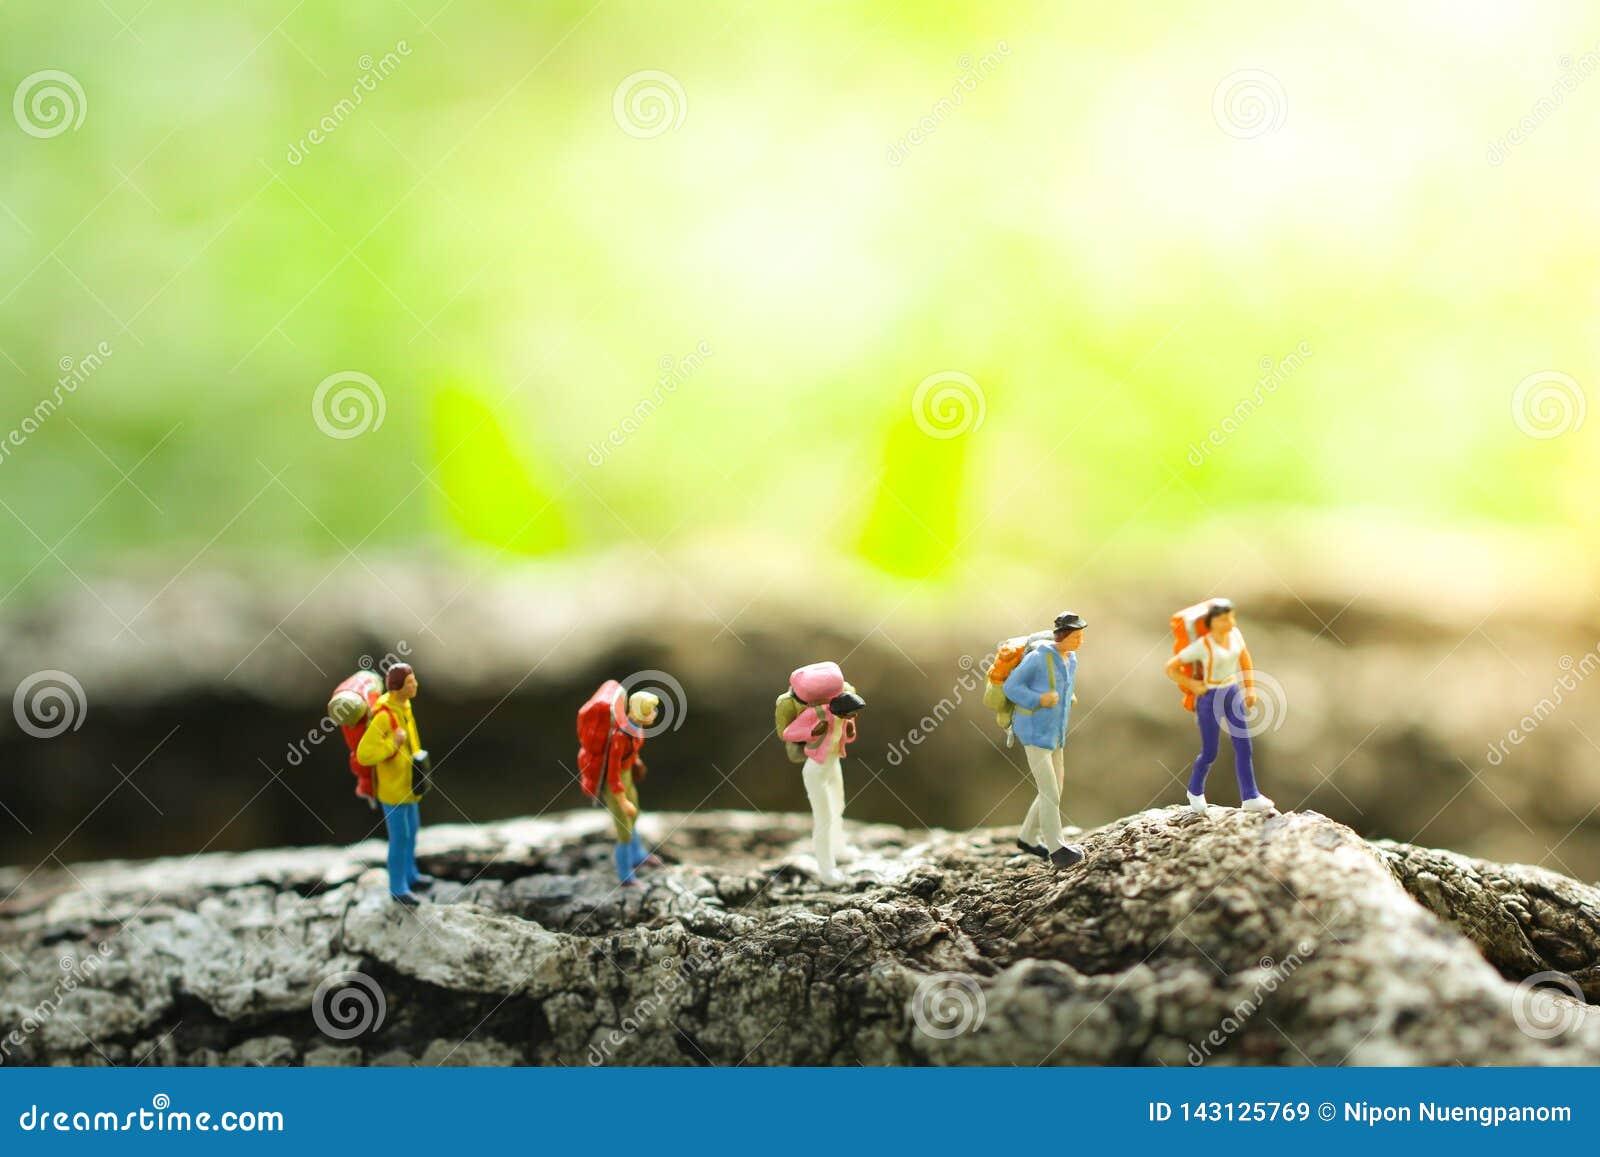 Five travelers trekking in jungle on greenery blurred background